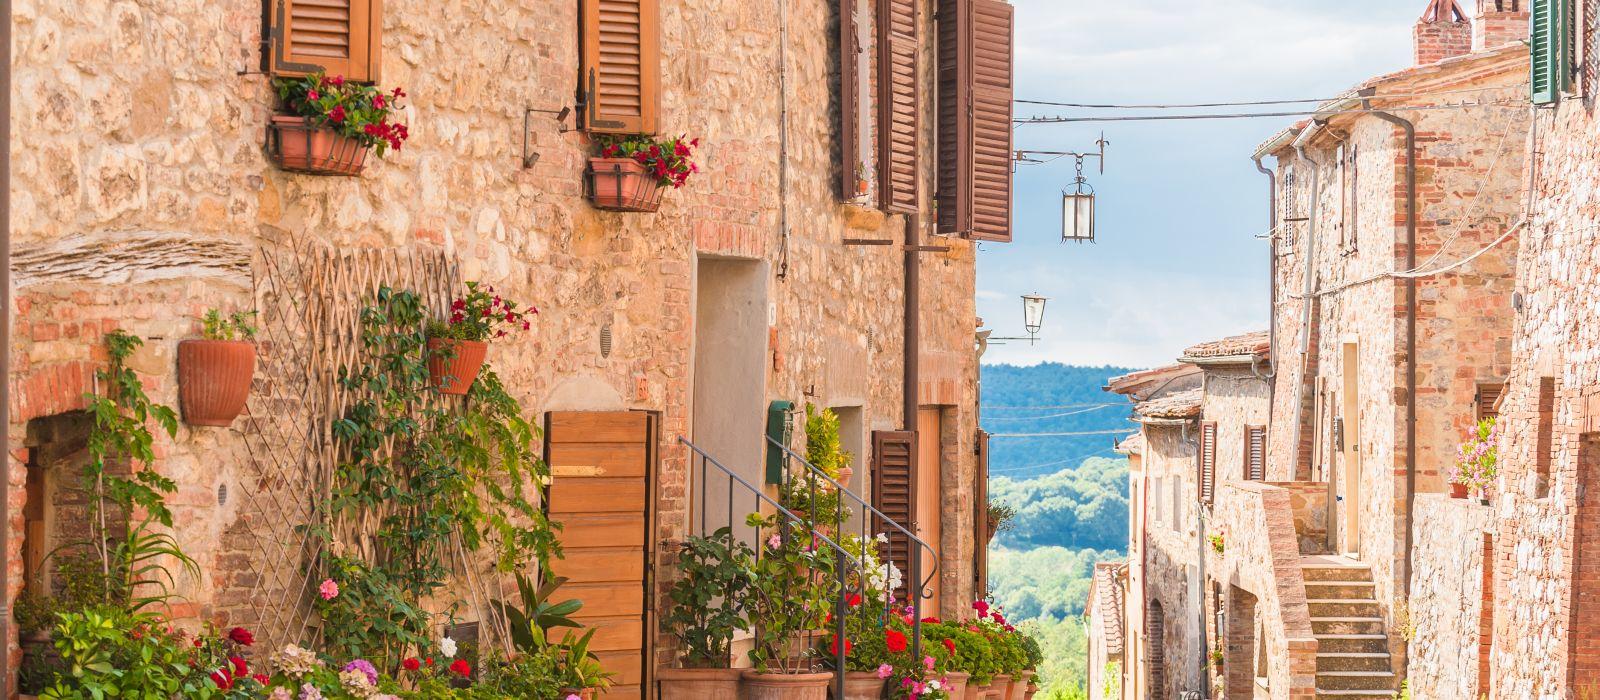 Destination Siena Italy